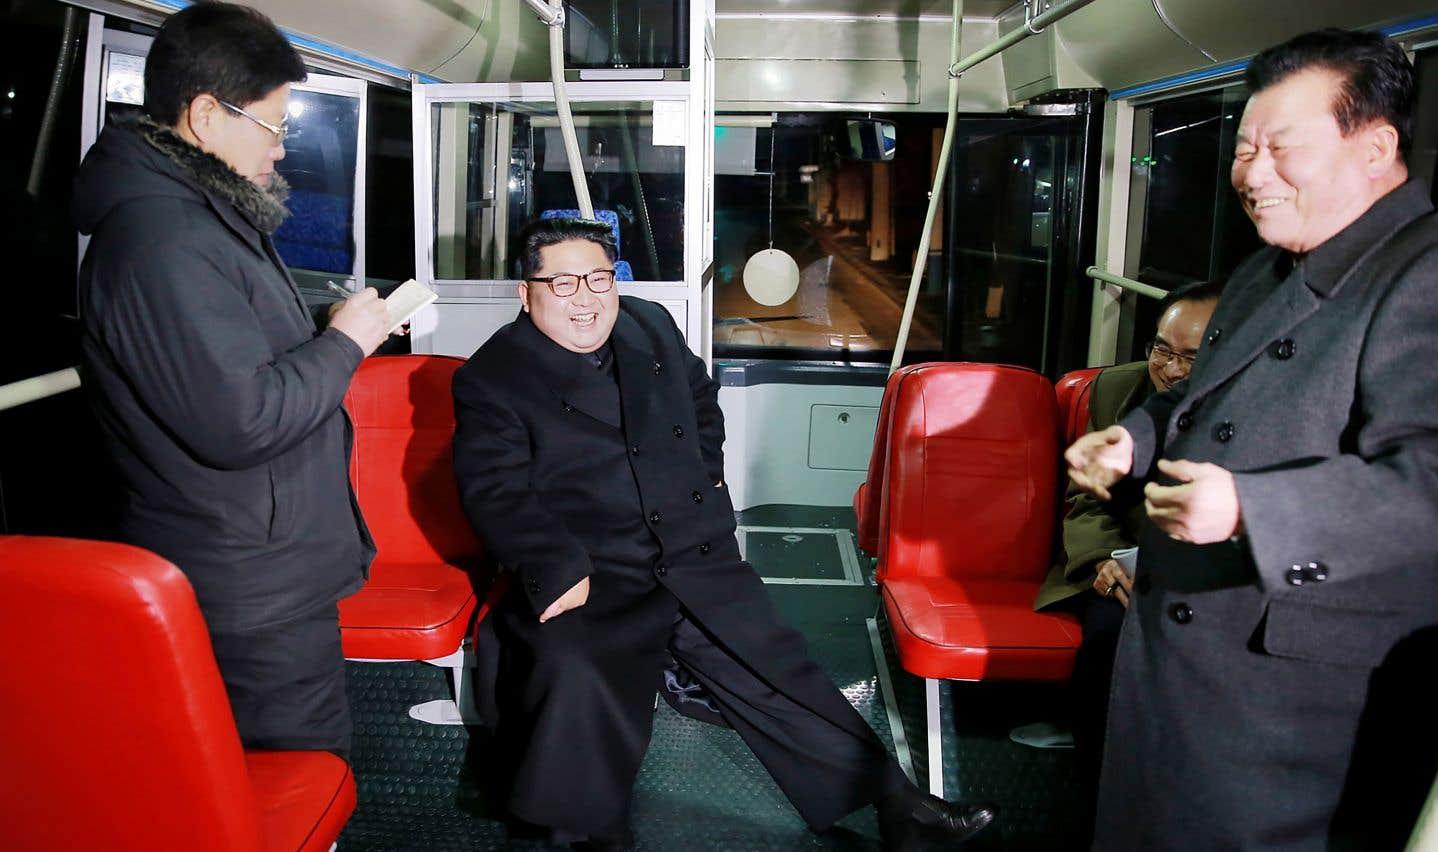 Jeux de Pyeongchang: un haut dirigeant nord-coréen attendu